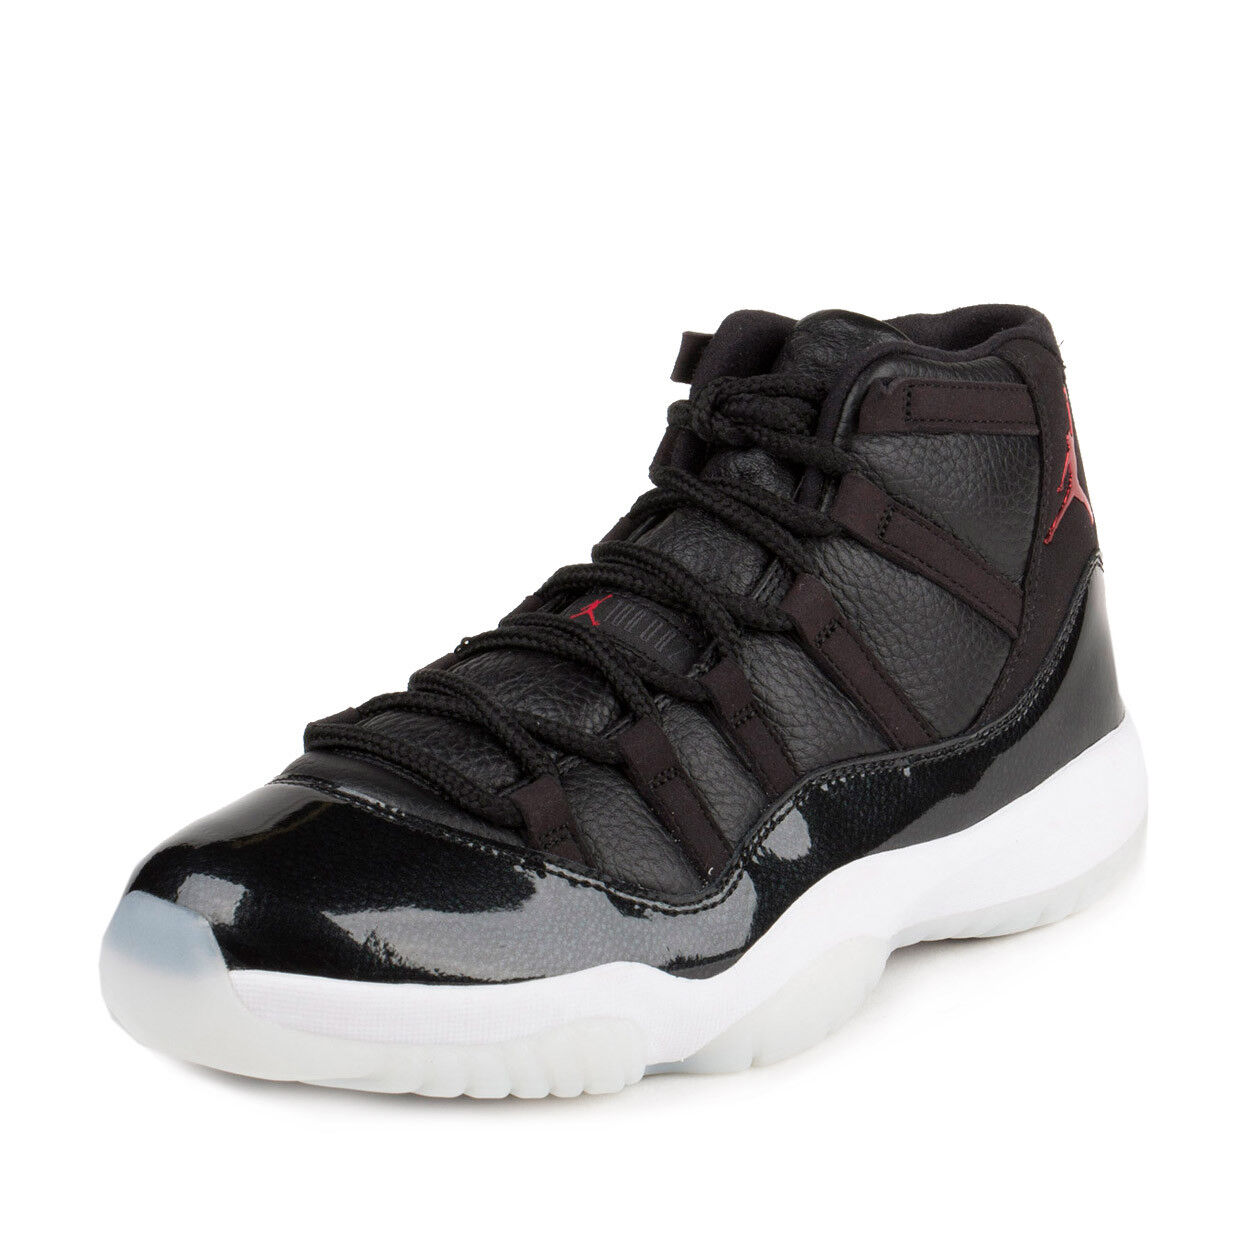 Nike Mens Air Jordan 11 Retro  72 10  Black Gym Red-White 378037-002